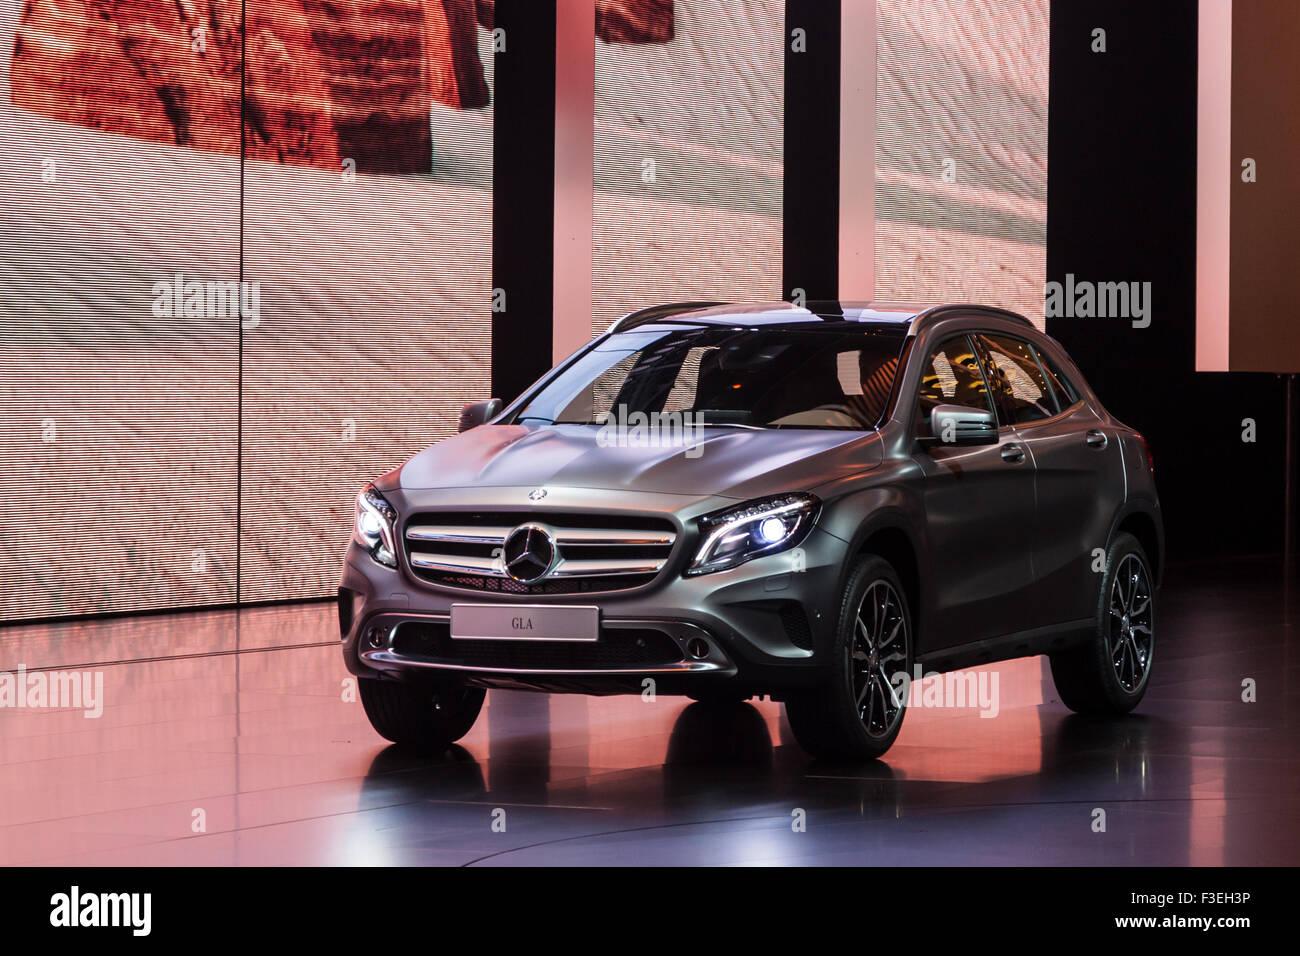 Mercedes Benz GLA  at the IAA International Motor Show 2015 - Stock Image